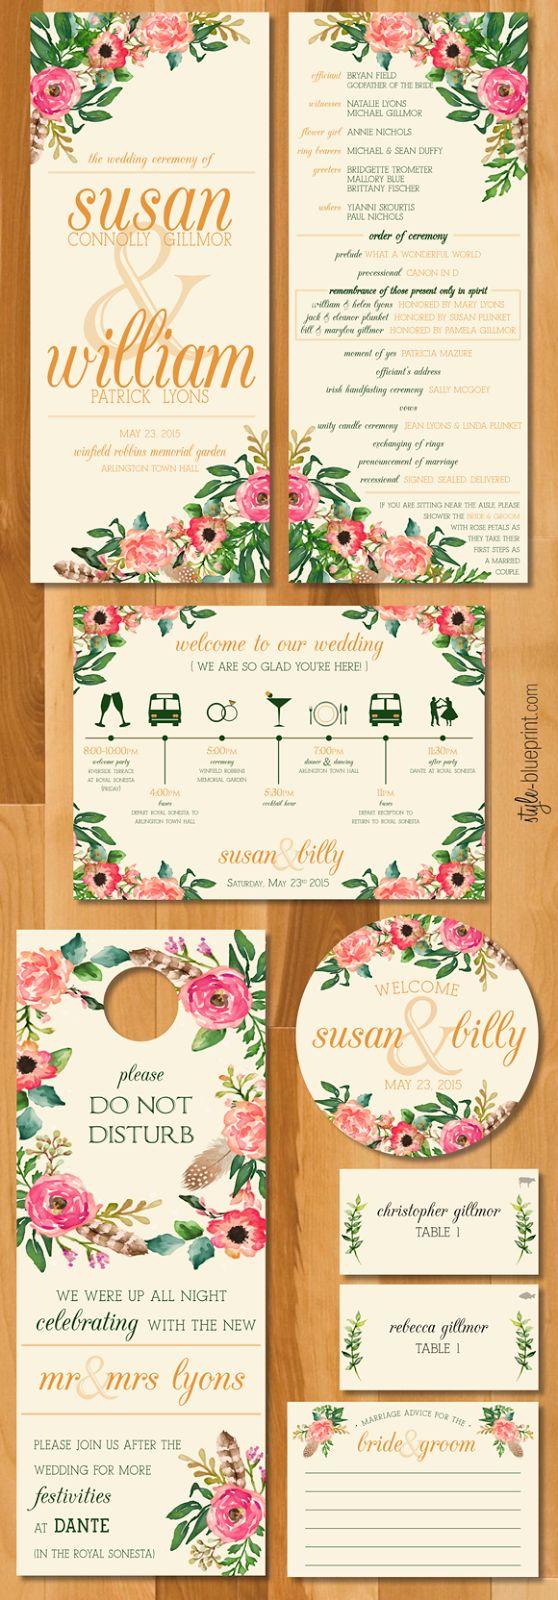 custom floral wedding suite  //  itinerary, hotel bag stickers, door hangers, programs, advice cards, escort cards